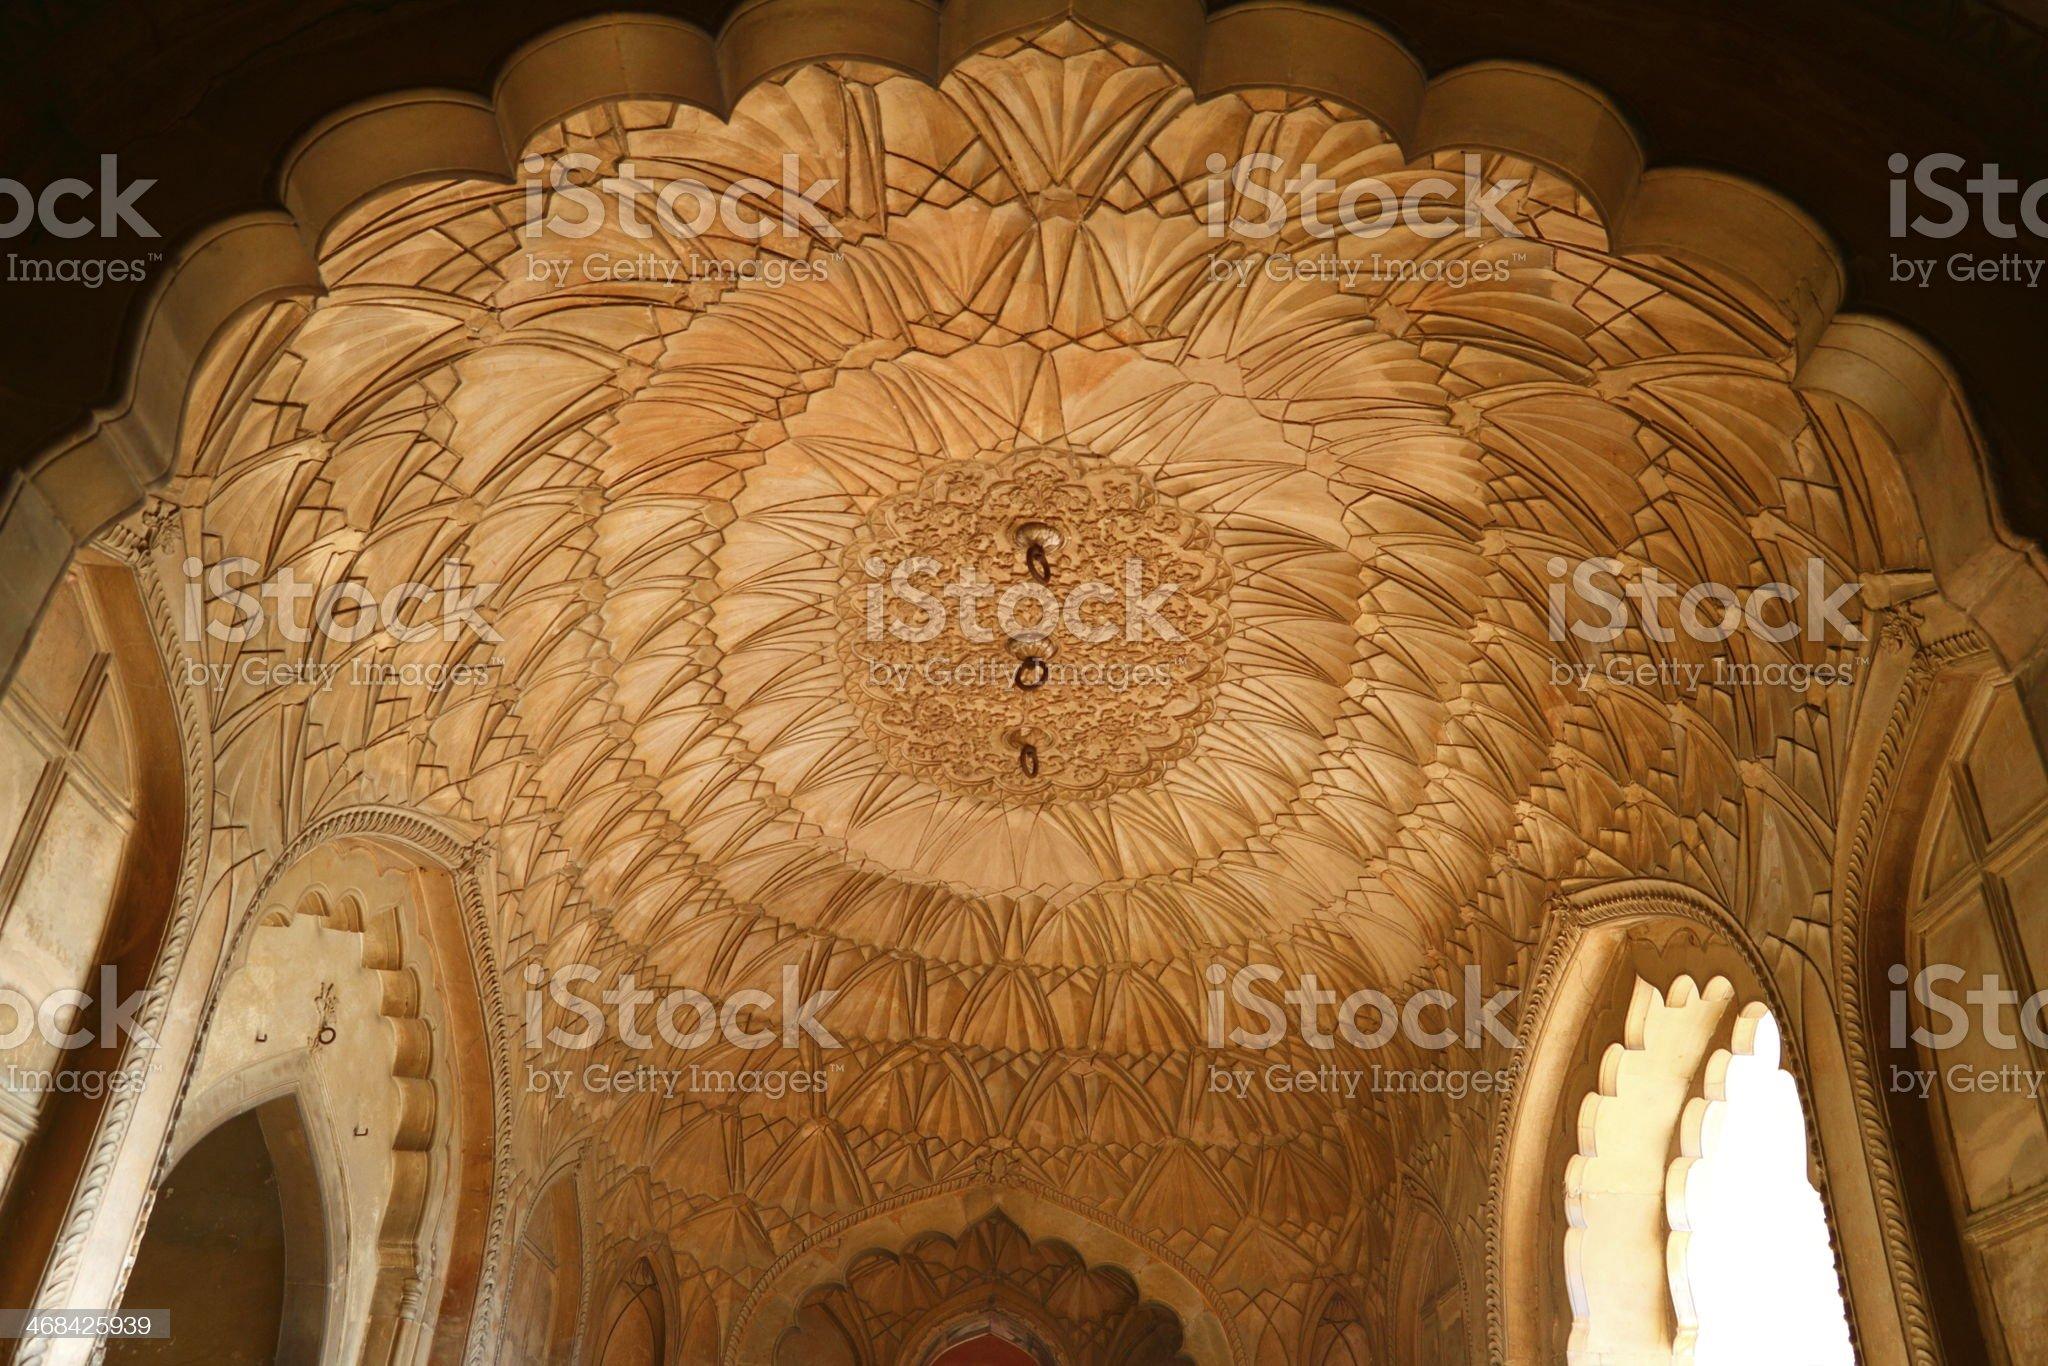 Safdarjung's Tomb royalty-free stock photo